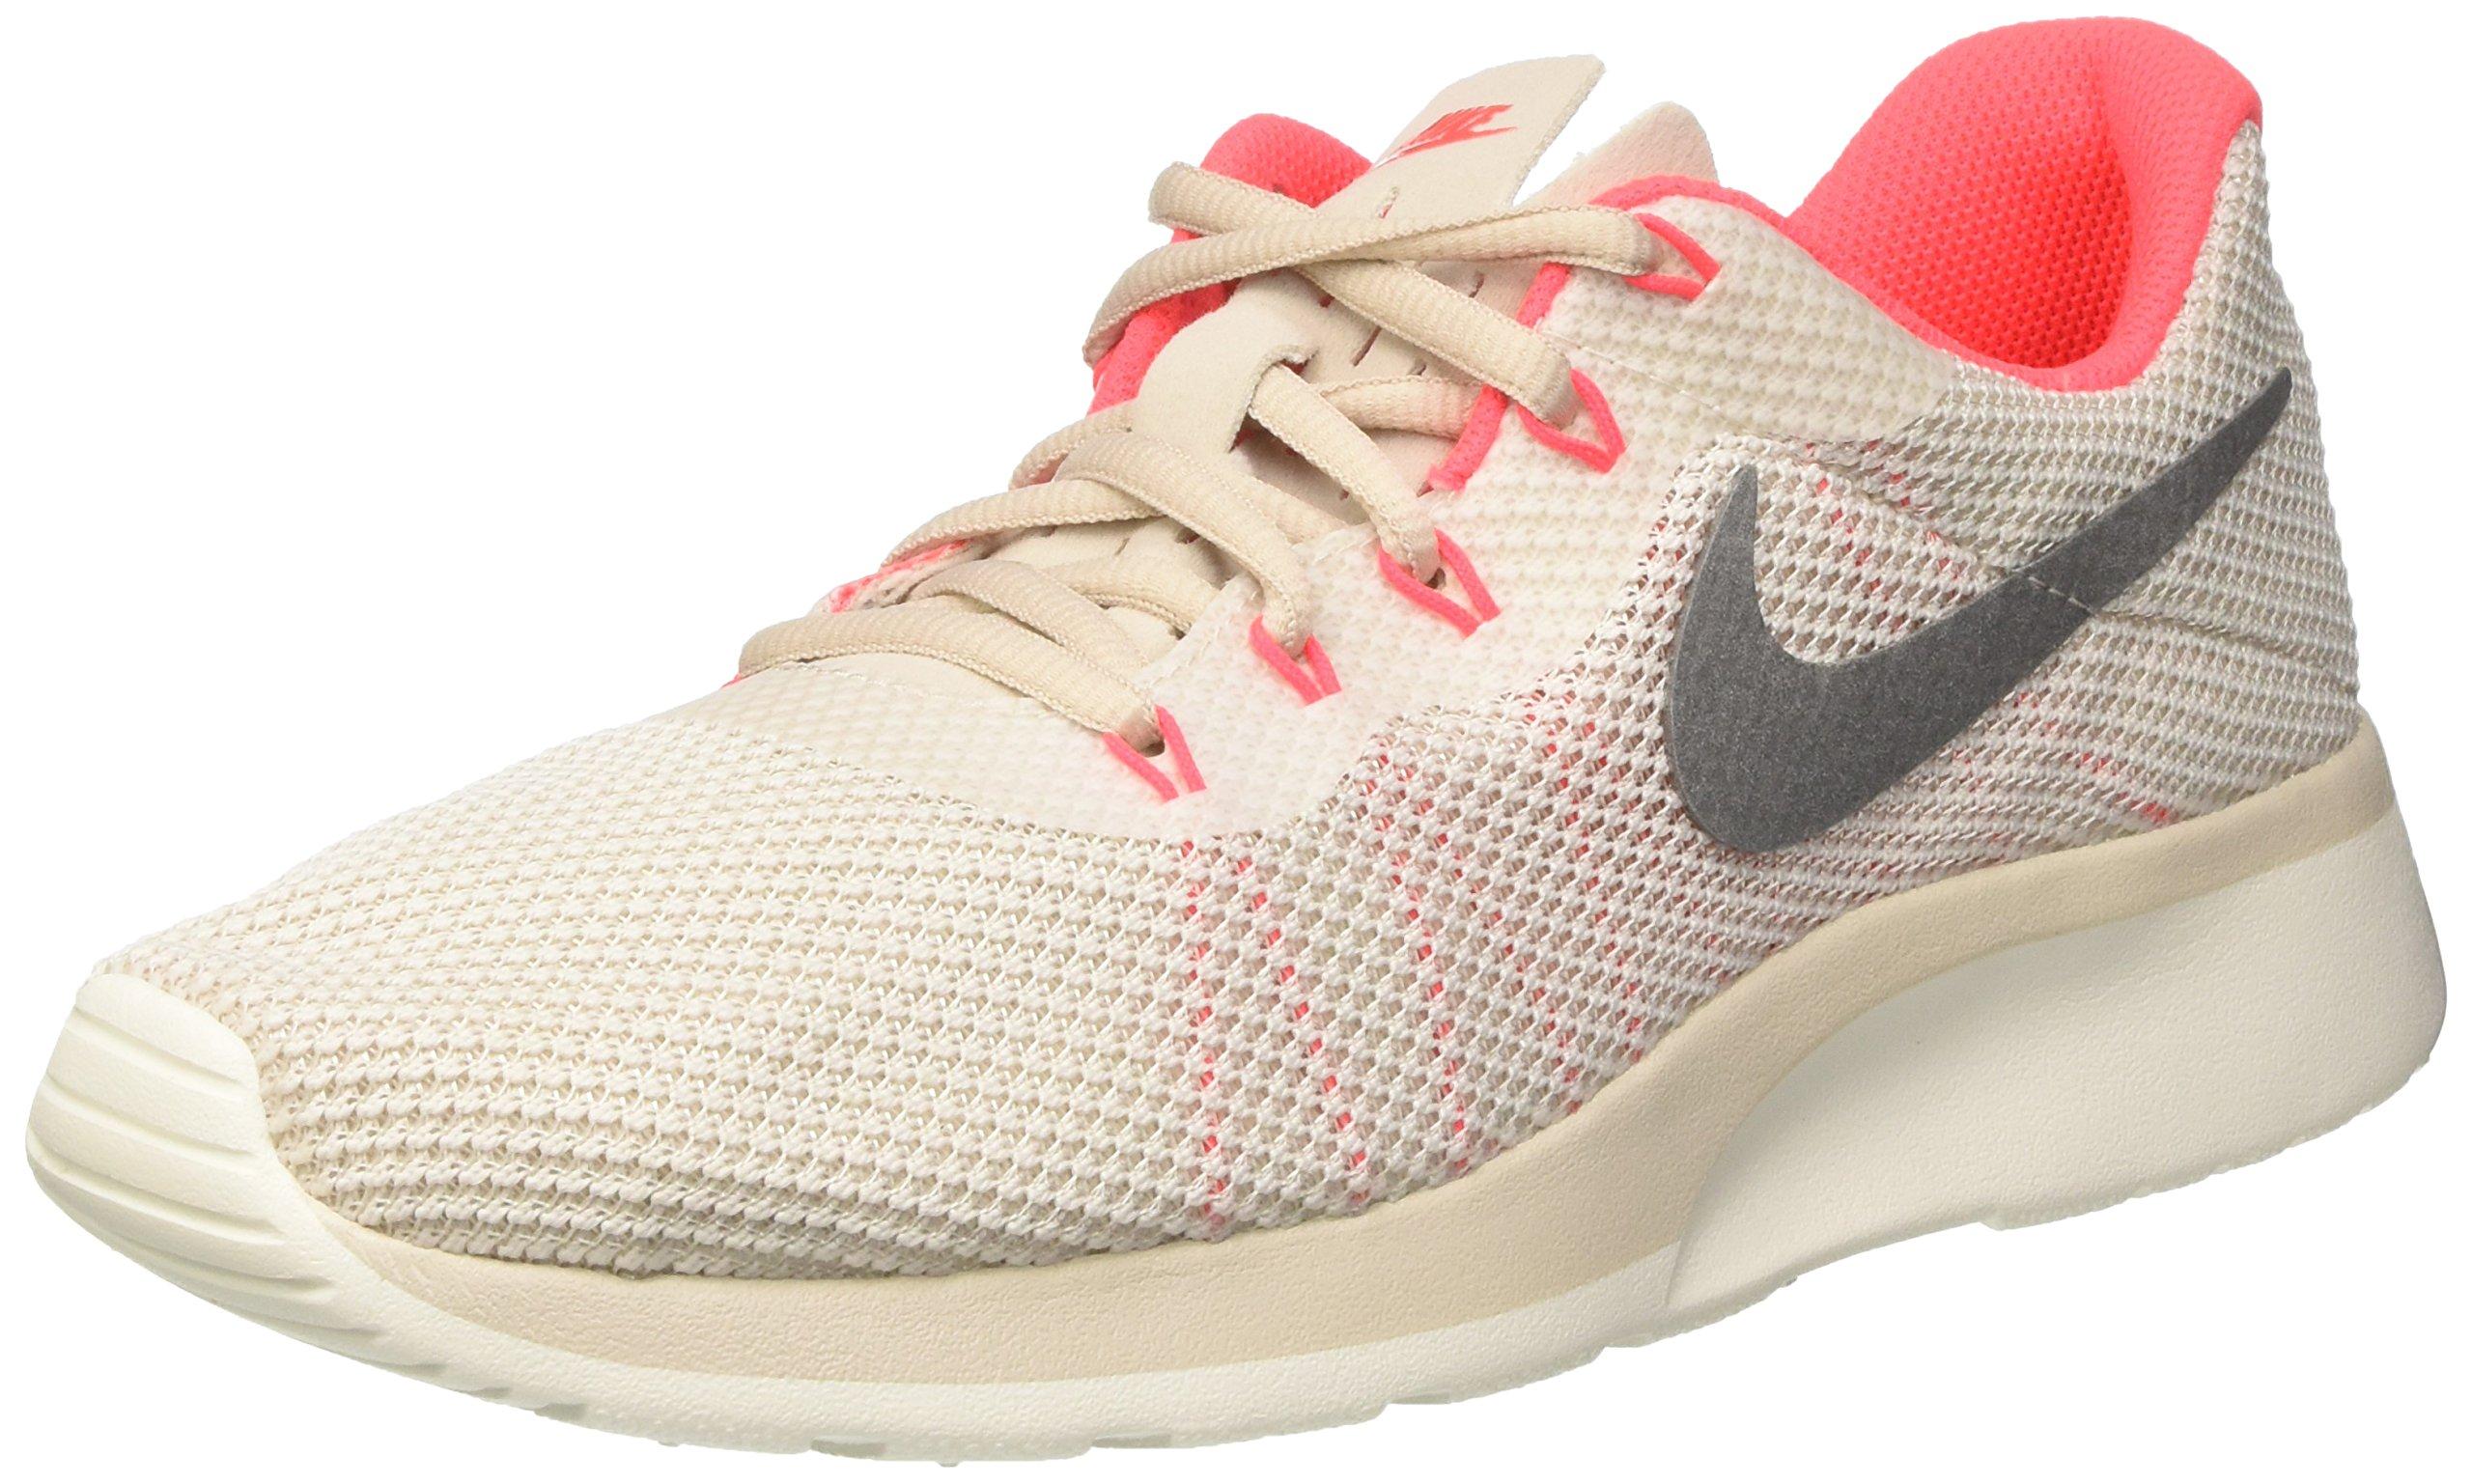 Nike Women's Tanjun Racer Running Shoe LT Orewood Brn/Chrom-Sail-Solar Red 10